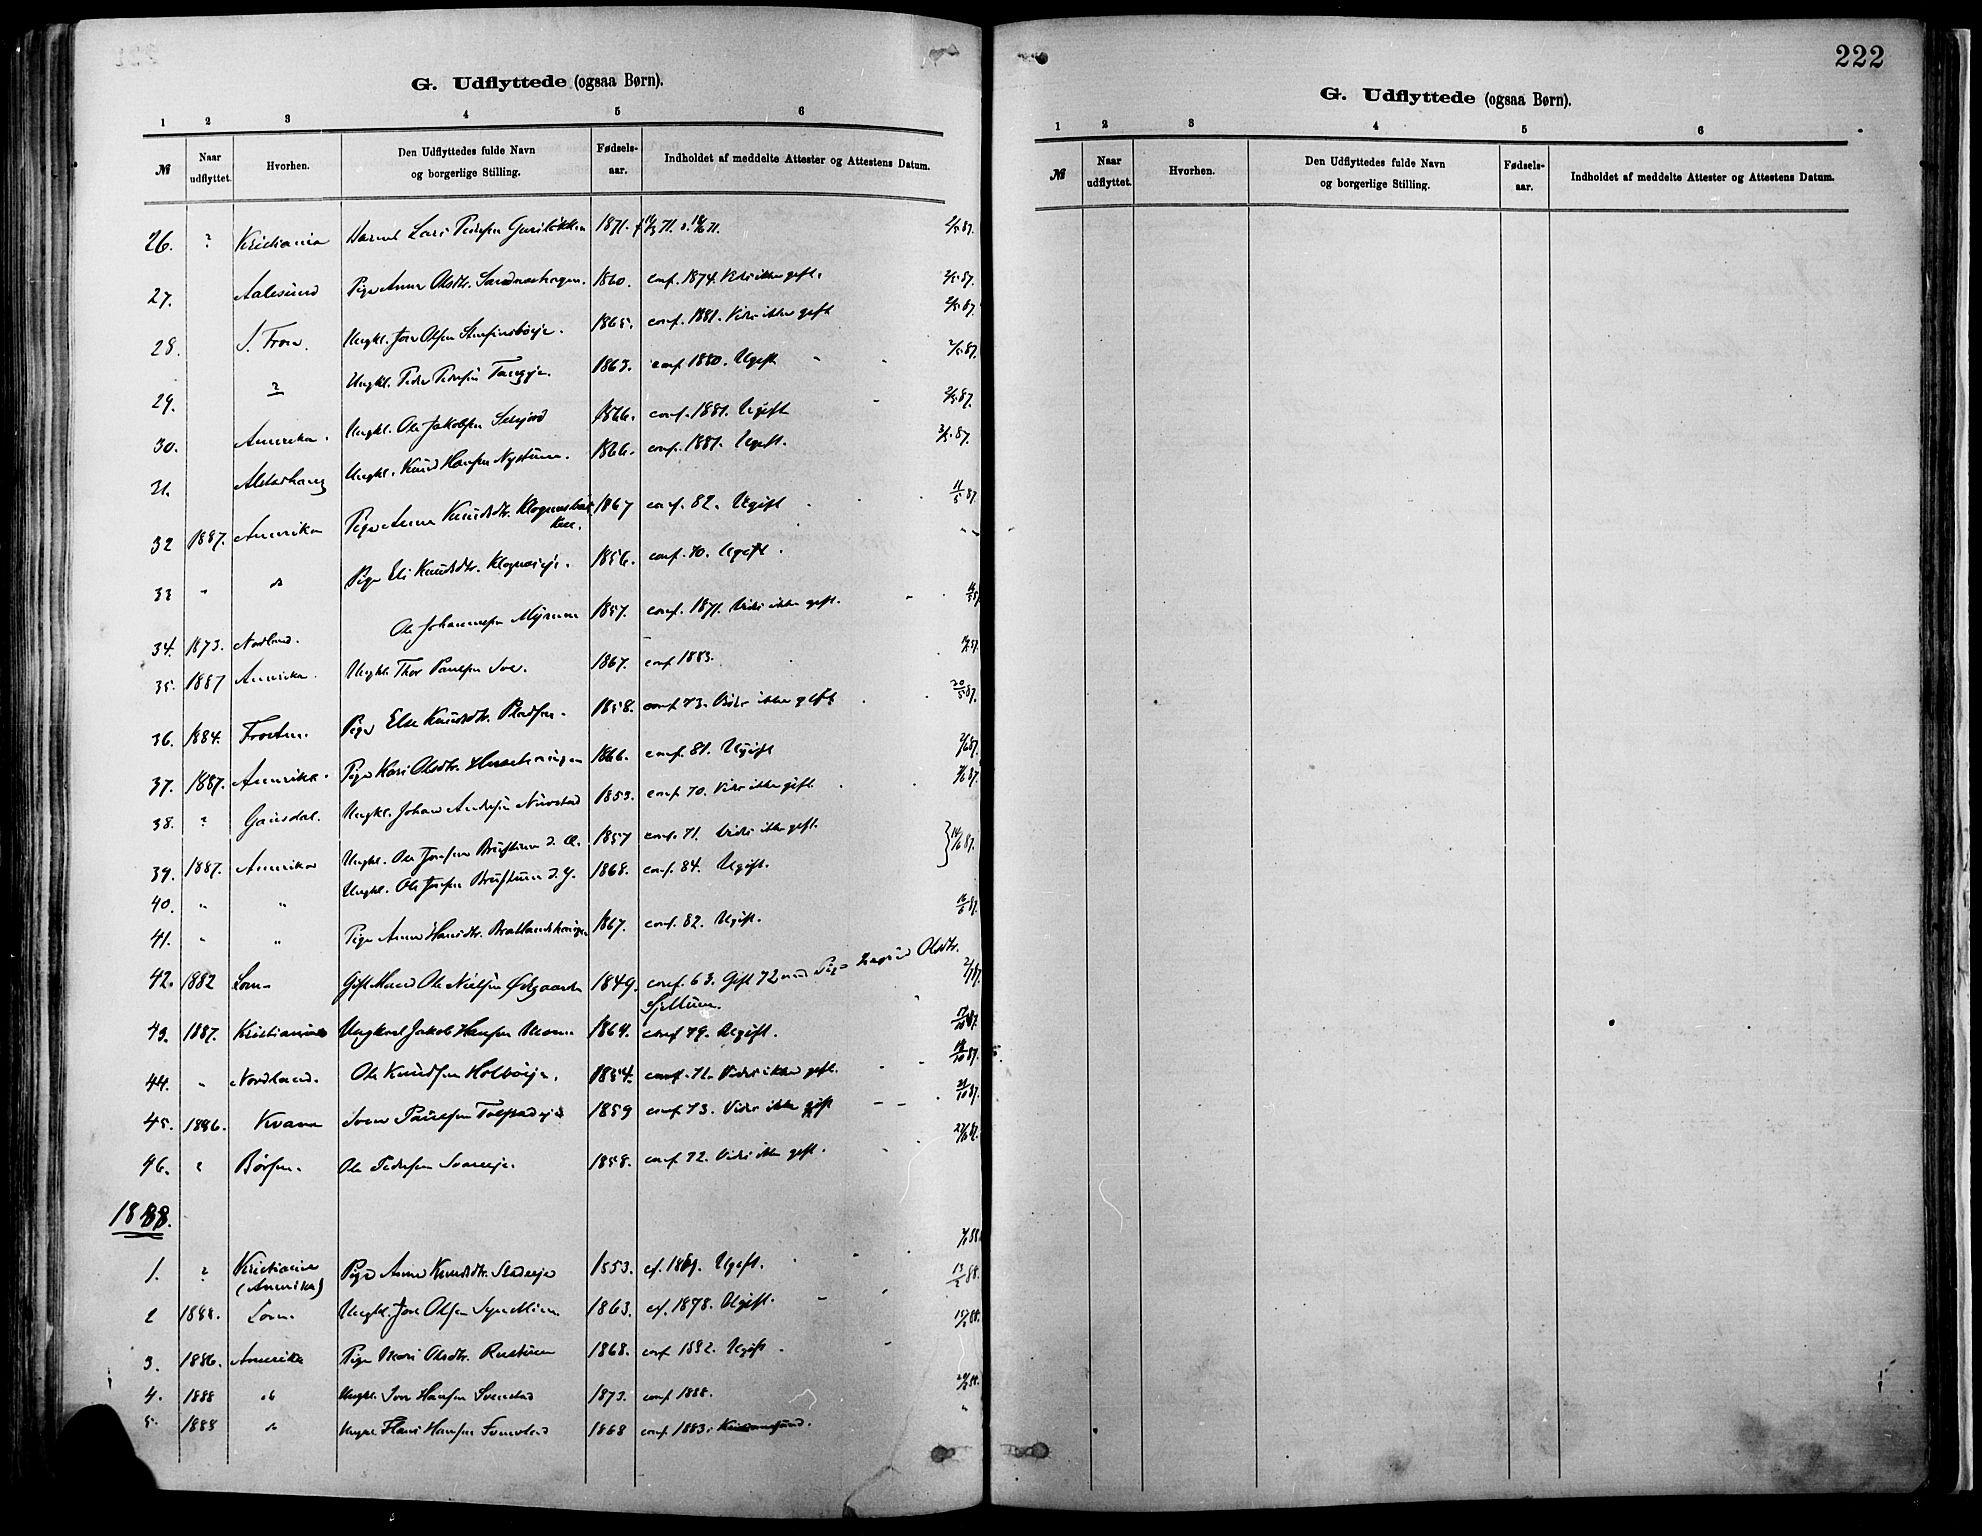 SAH, Vågå prestekontor, Ministerialbok nr. 9, 1886-1904, s. 222